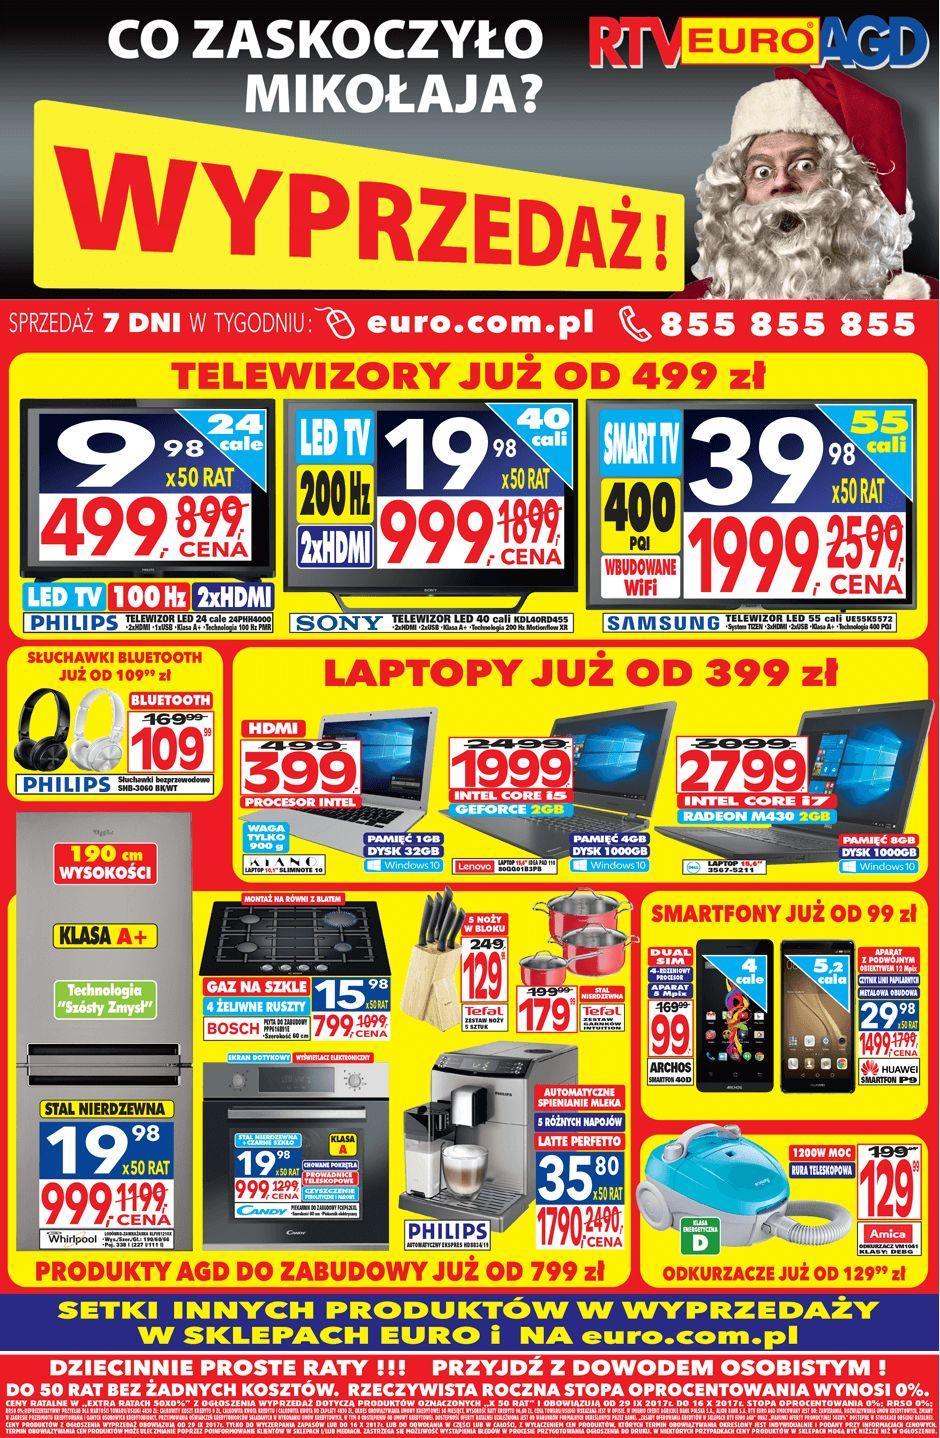 Gazetka promocyjna RTV Euro AGD do 16/10/2017 str.0